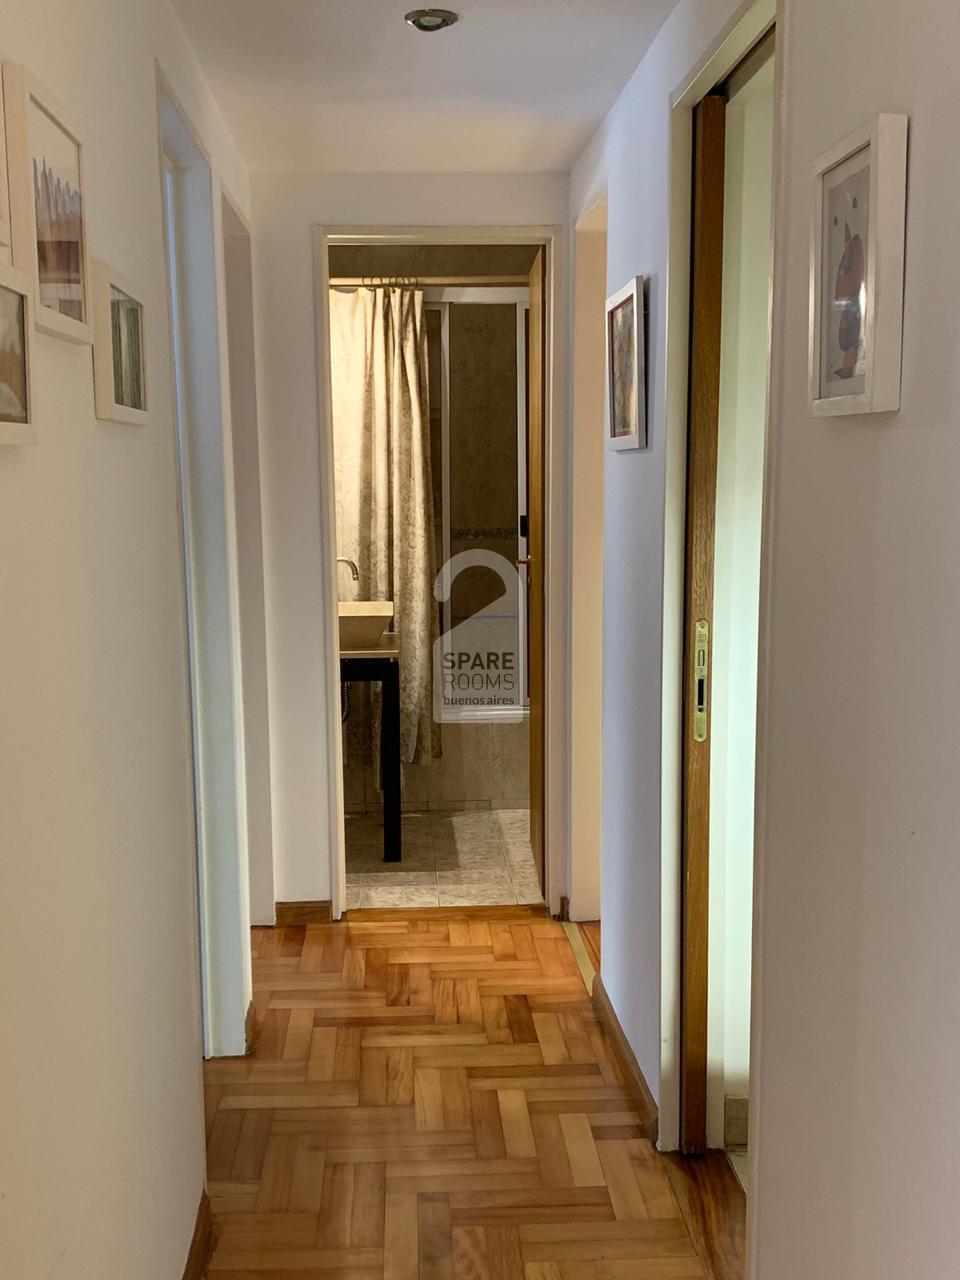 Hall access